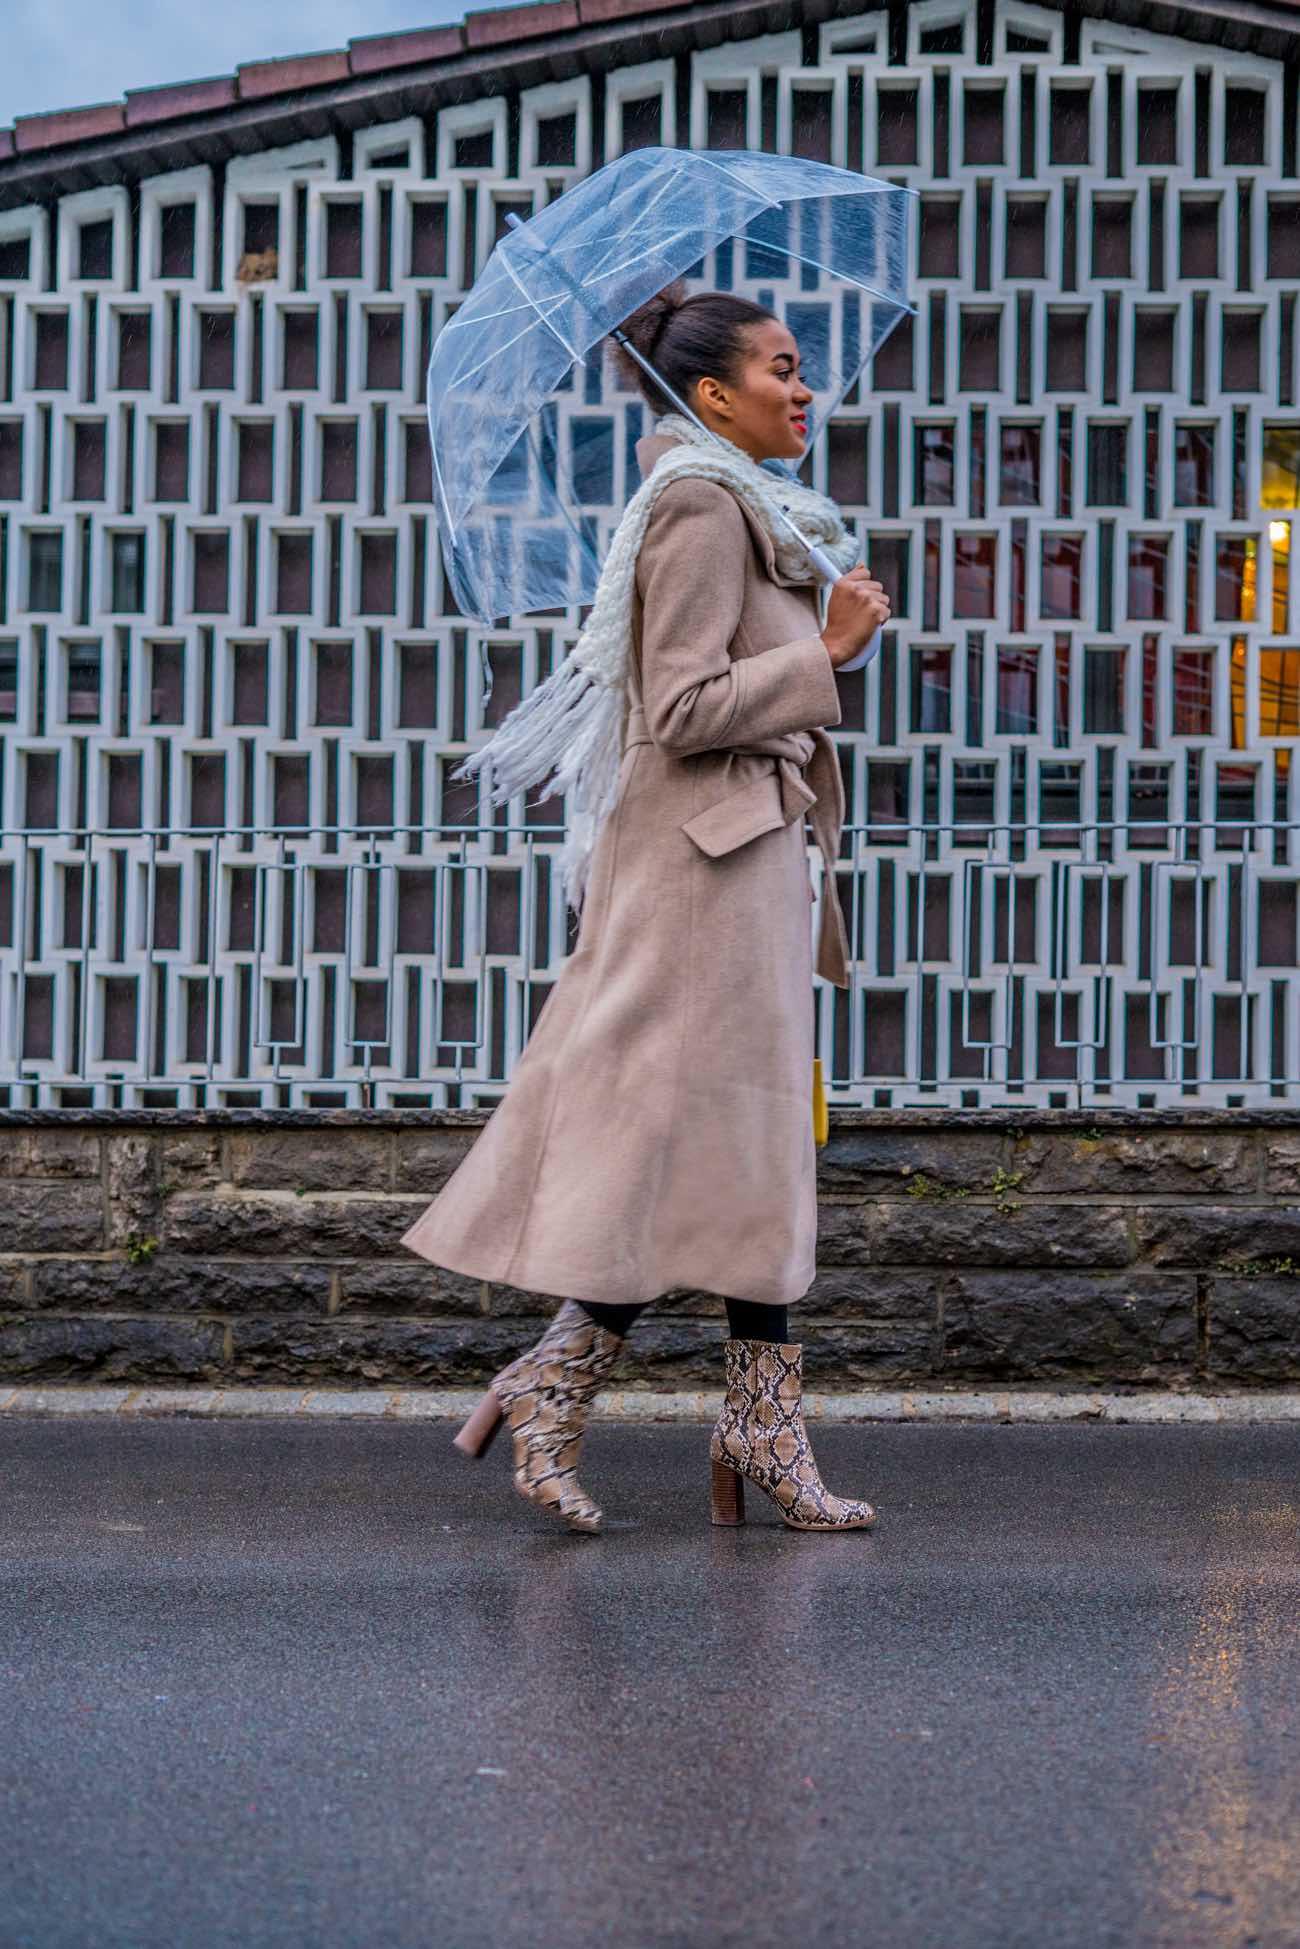 Blogger Apps in 2019, transparent umbrella, snake print